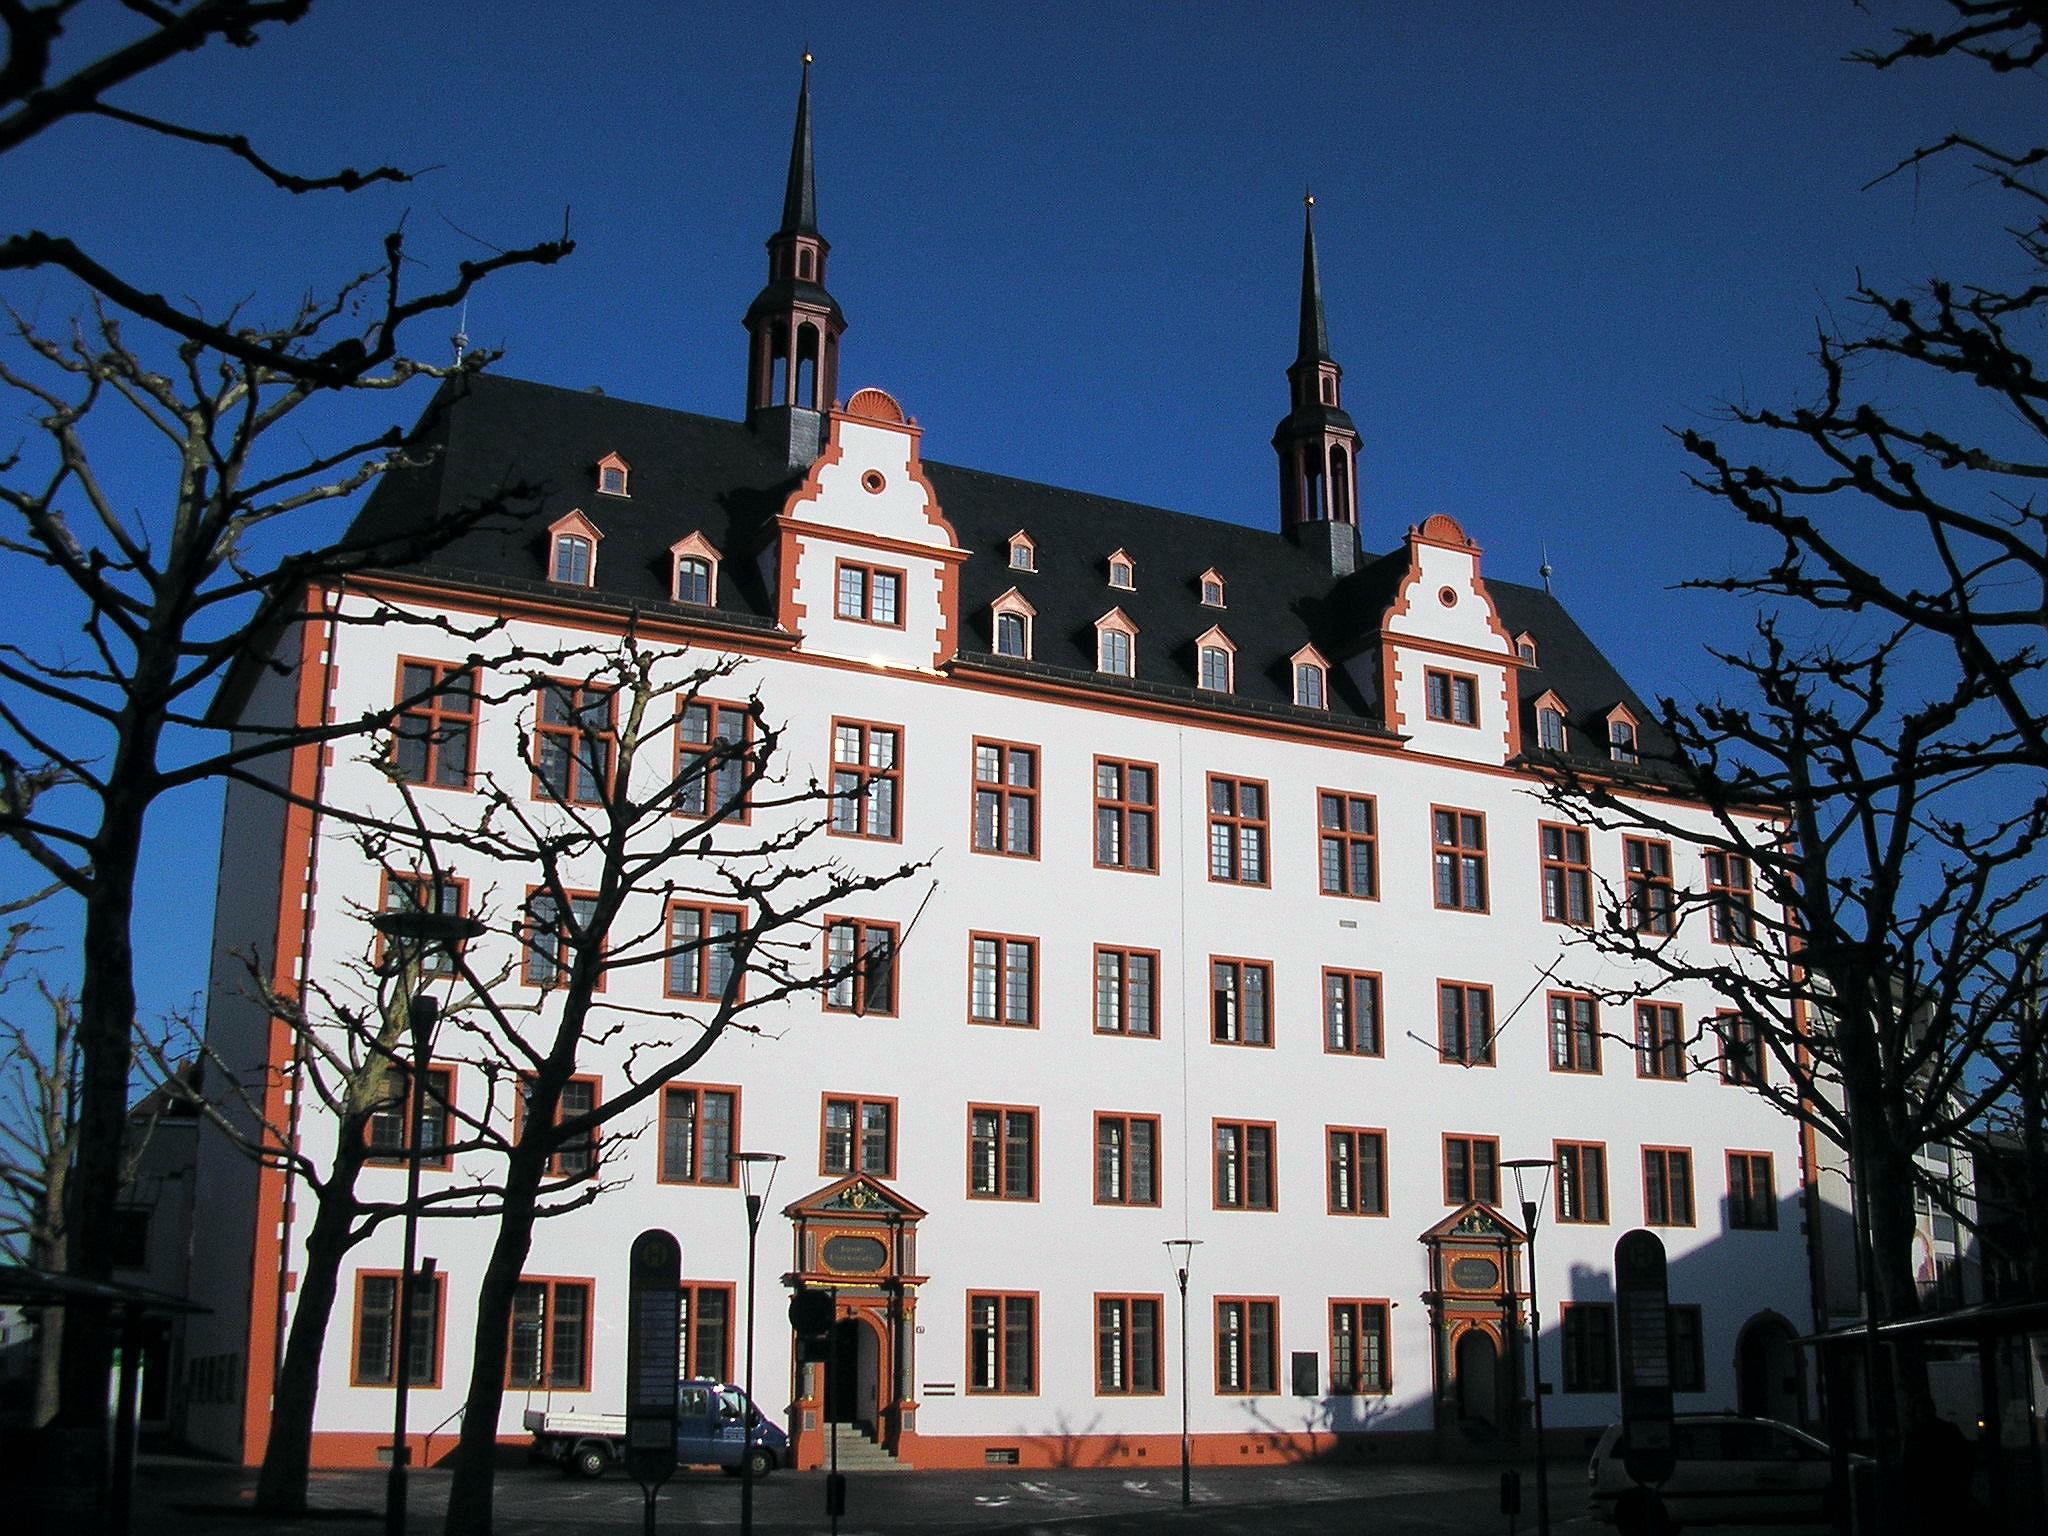 image of Johannes Gutenberg University Mainz